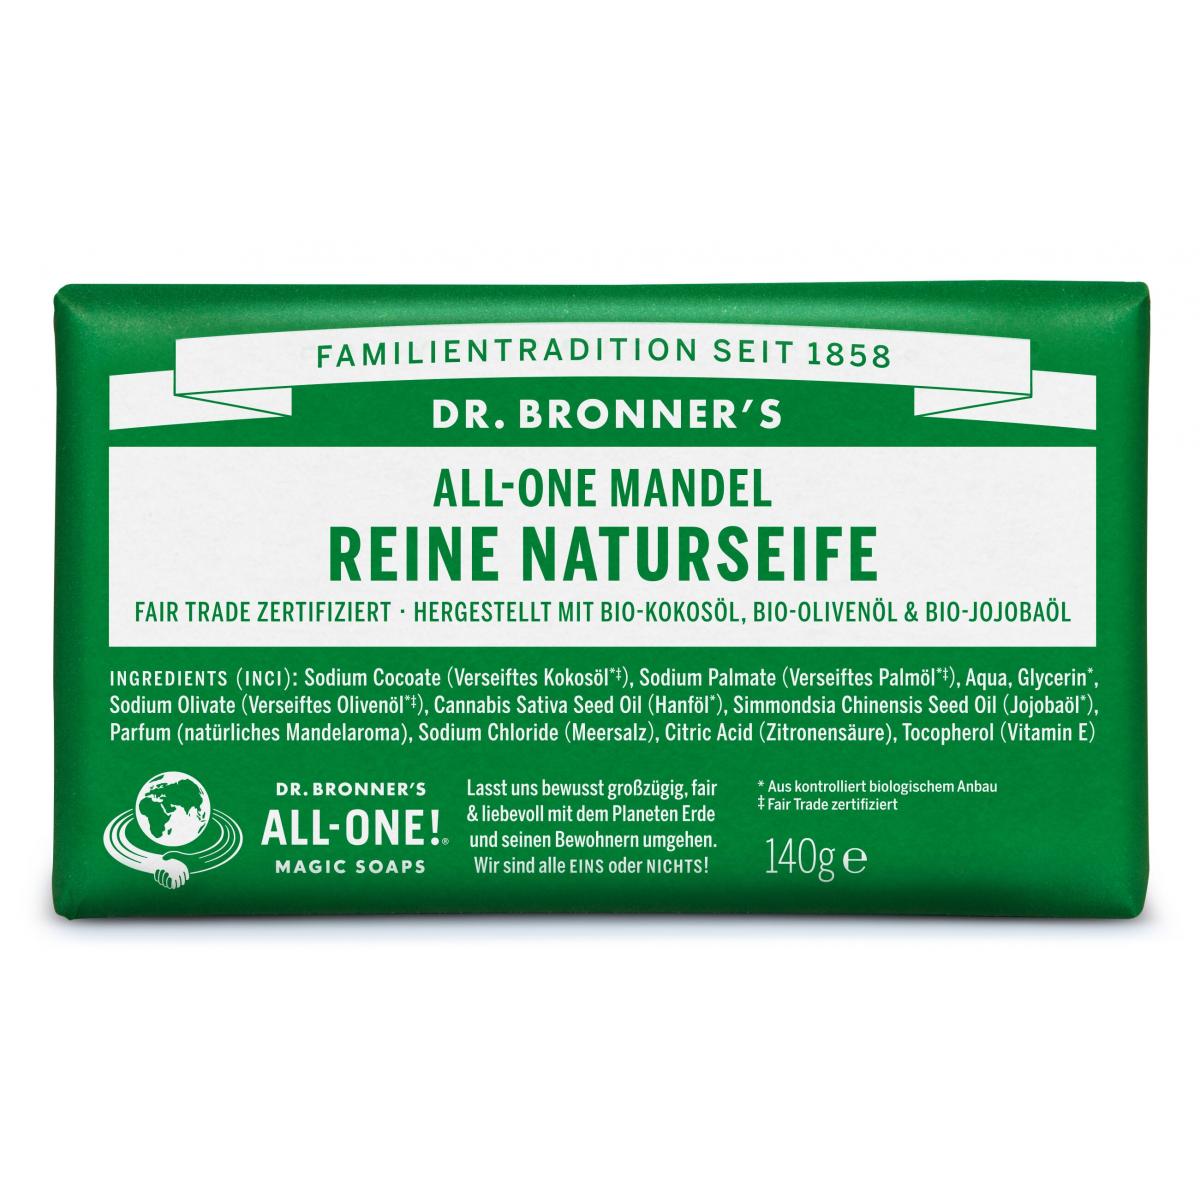 Dr. Bronner Seife Mandel